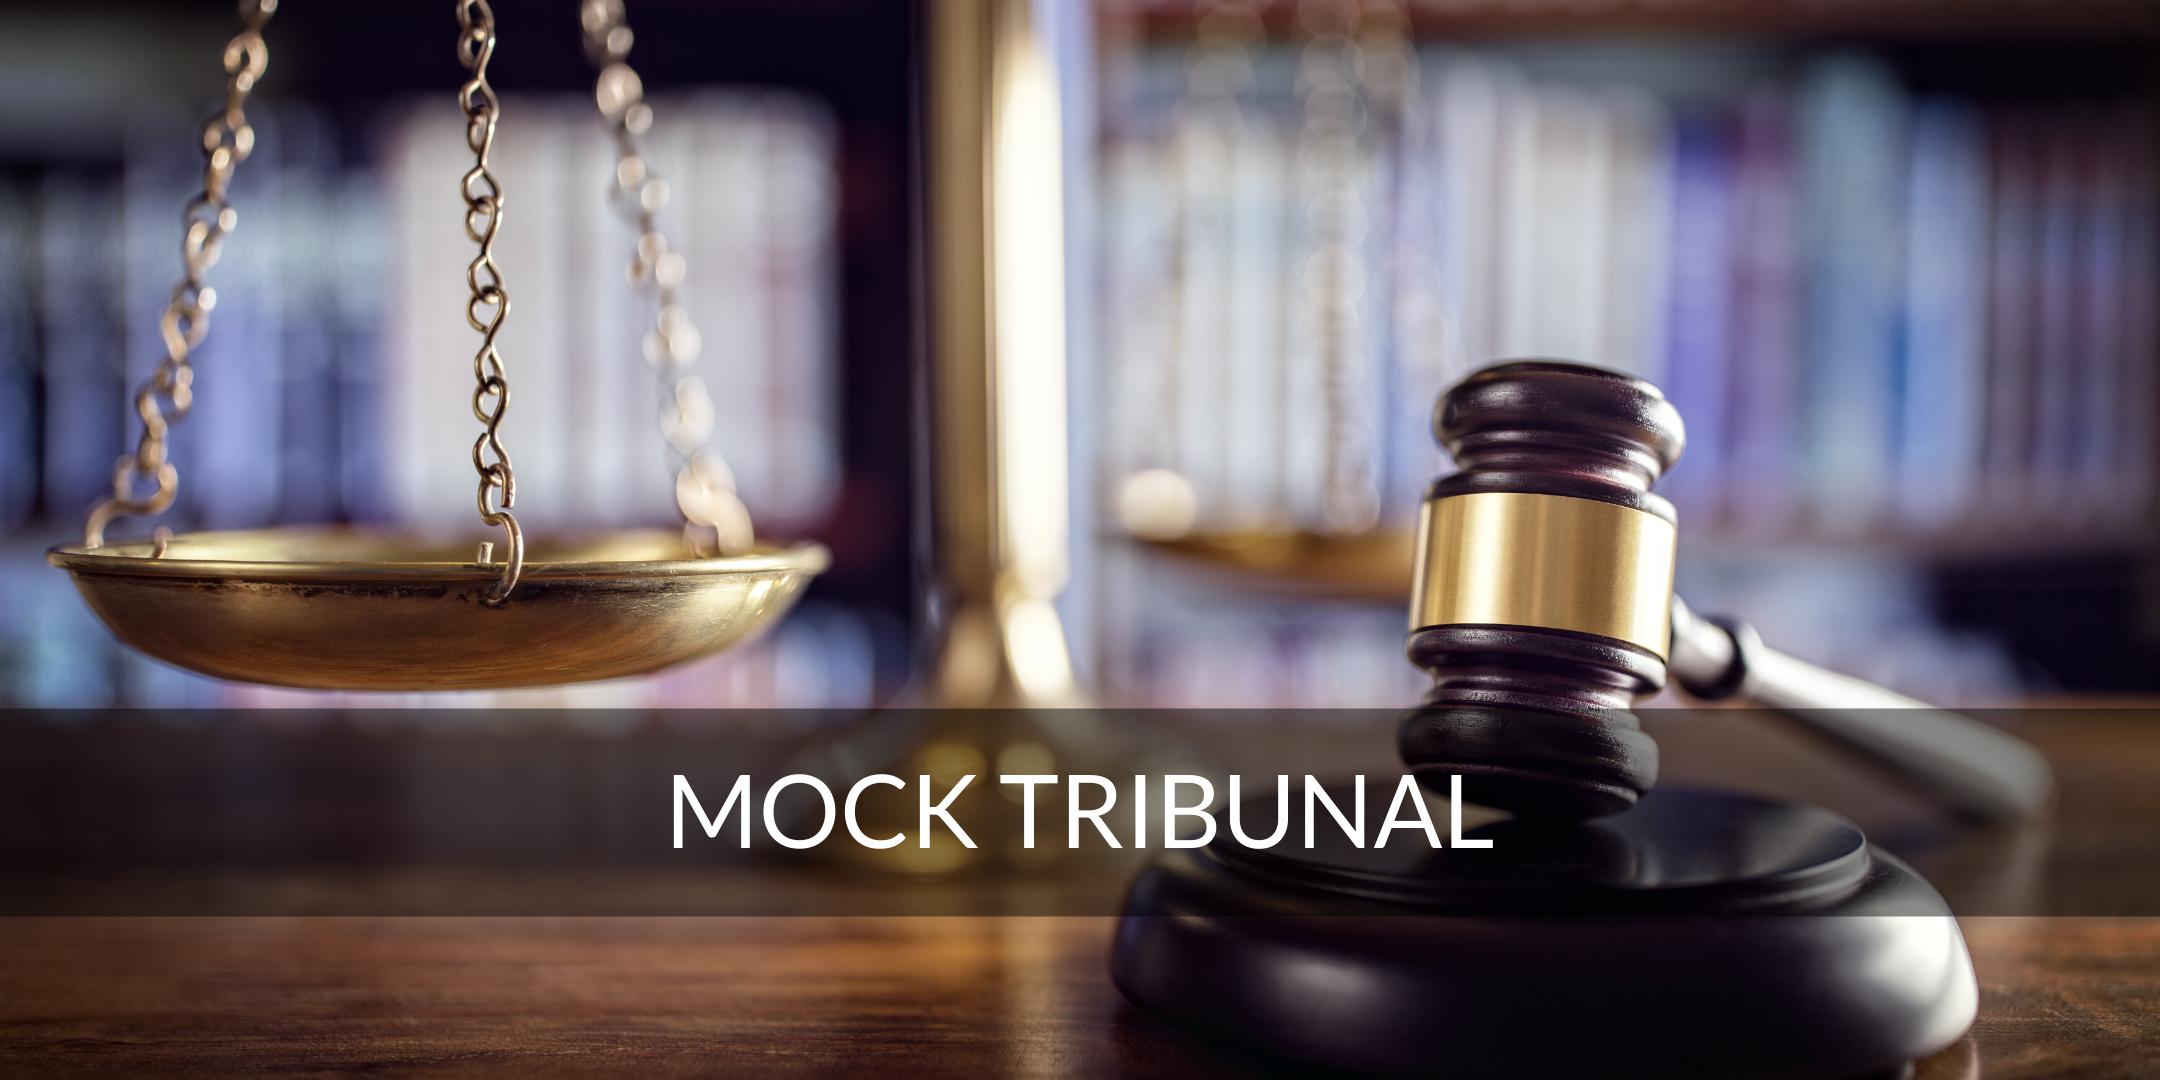 Mock Tribunal - Bournemouth